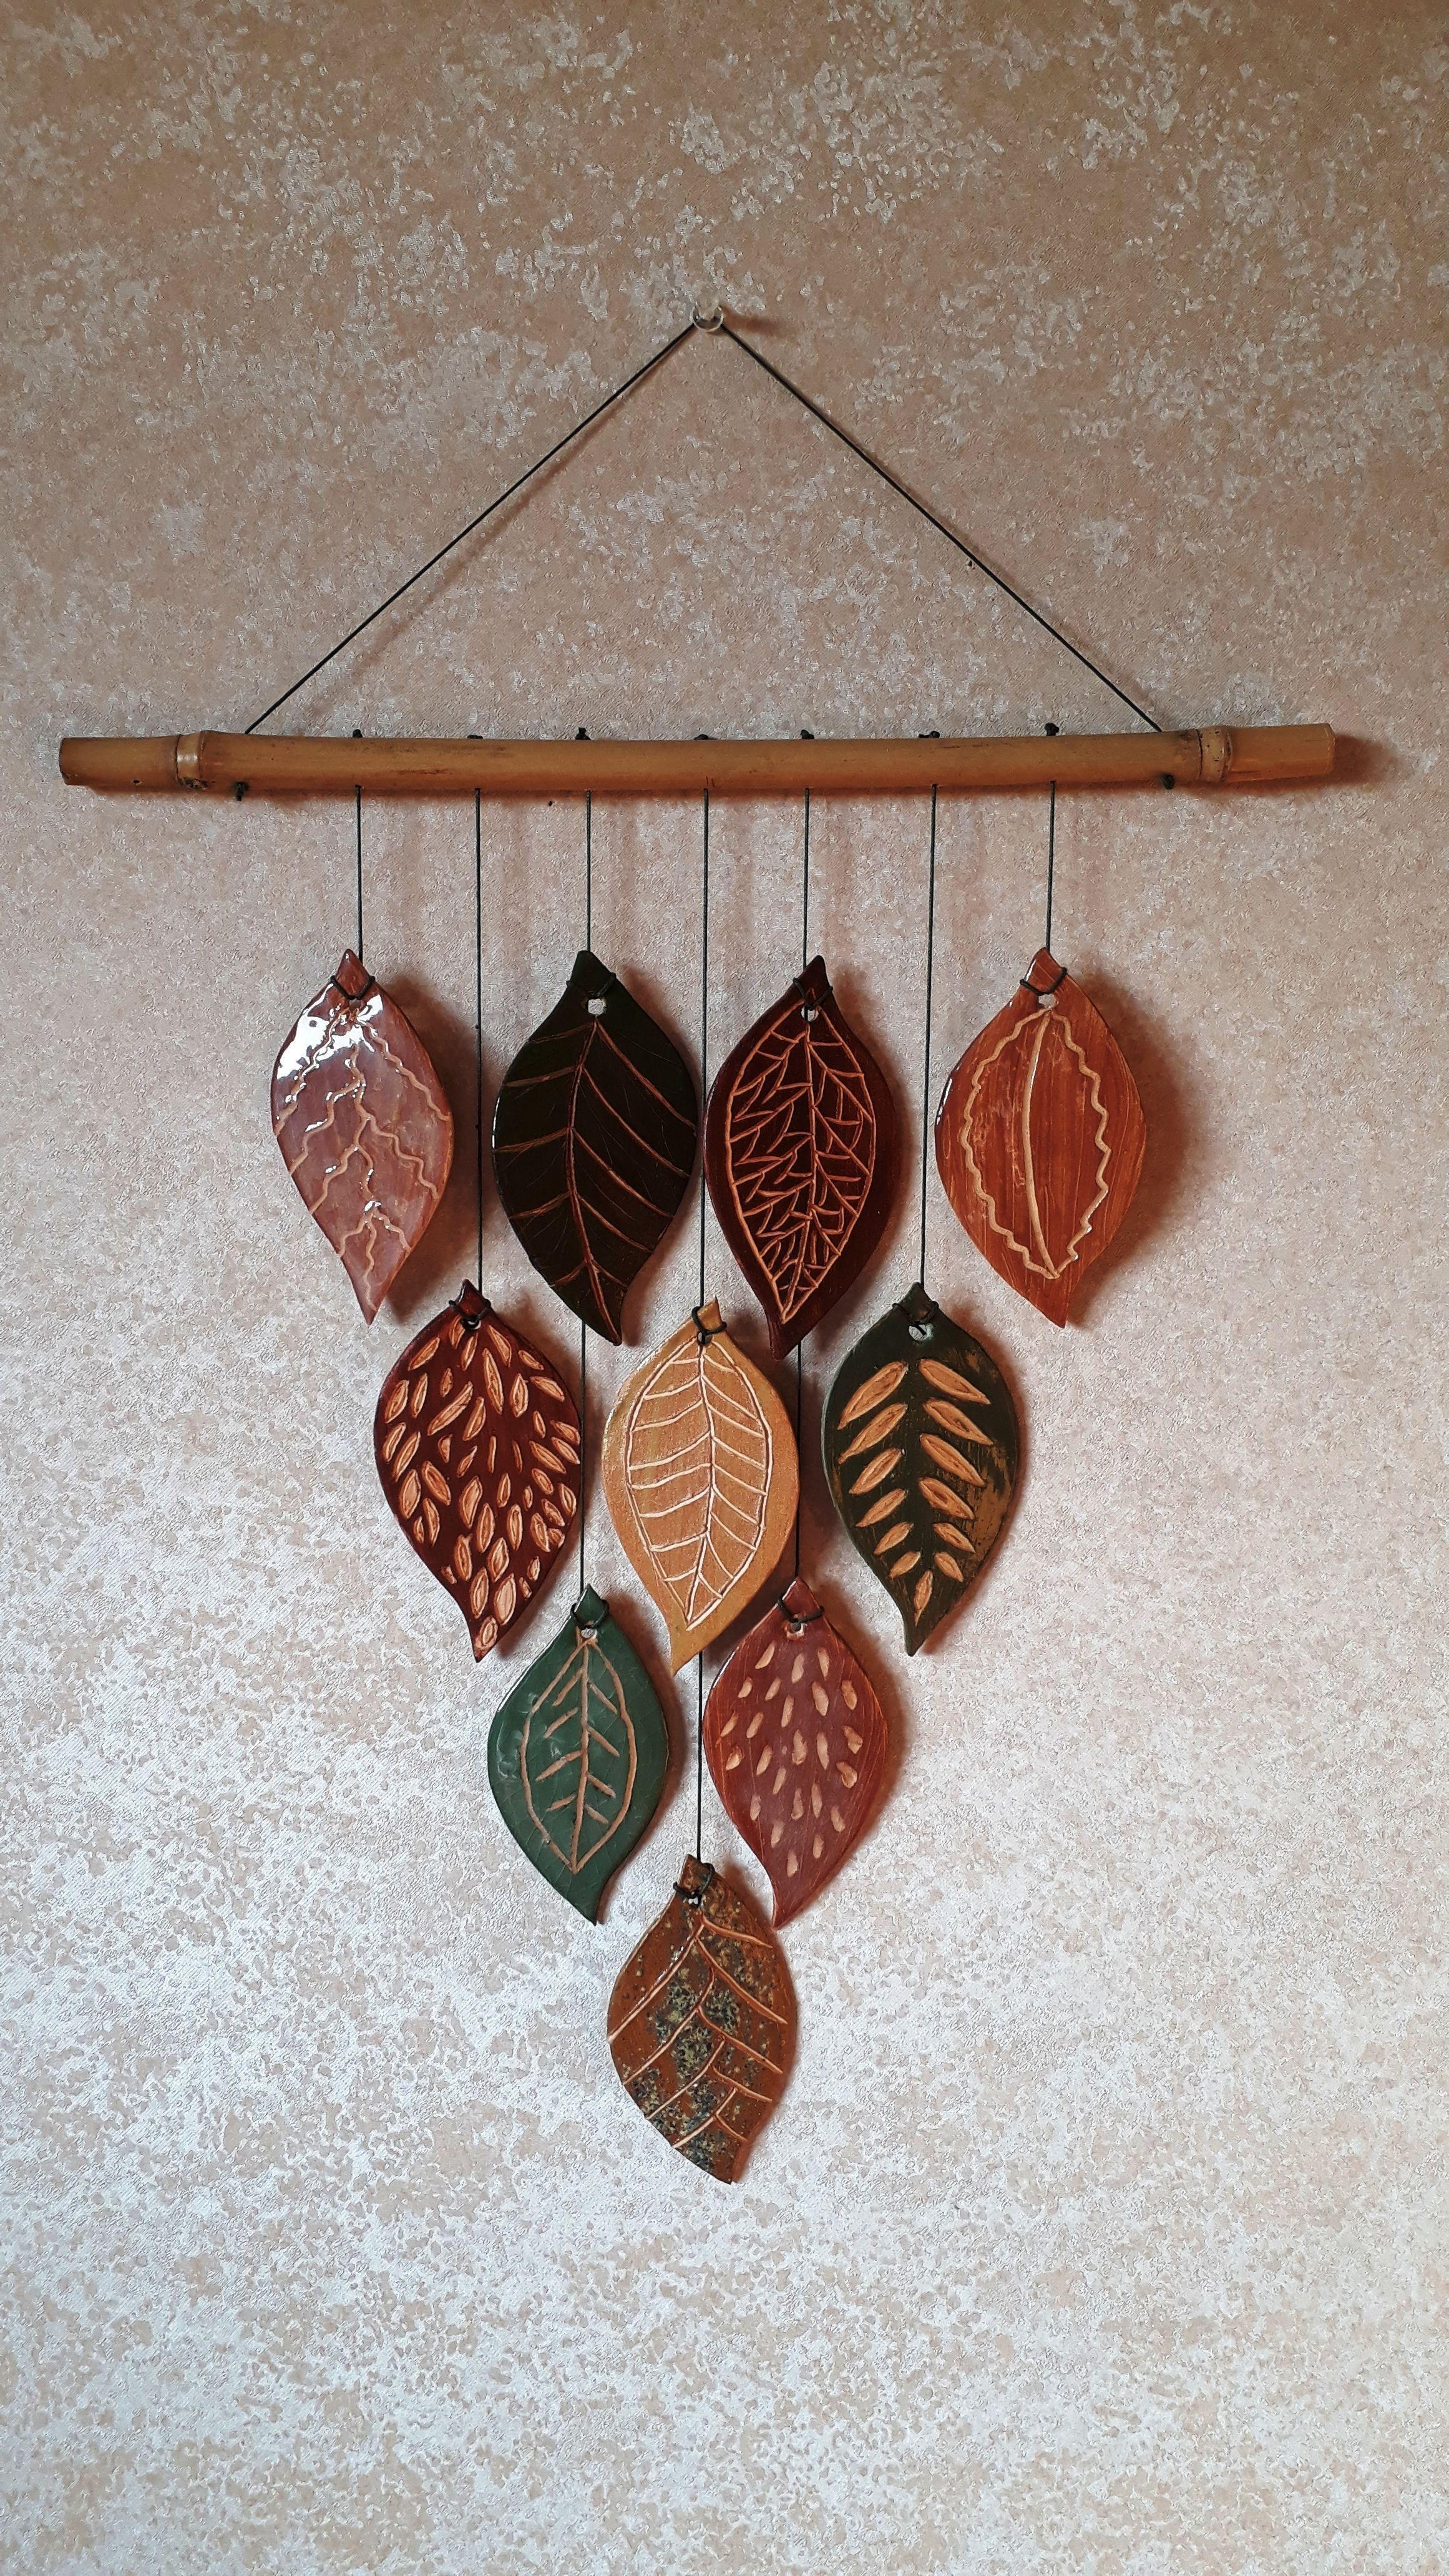 Keramik-Wand-Dekor-Blätter #slabpottery Keramische Wand-Dekor-Blätter #paintedpottery